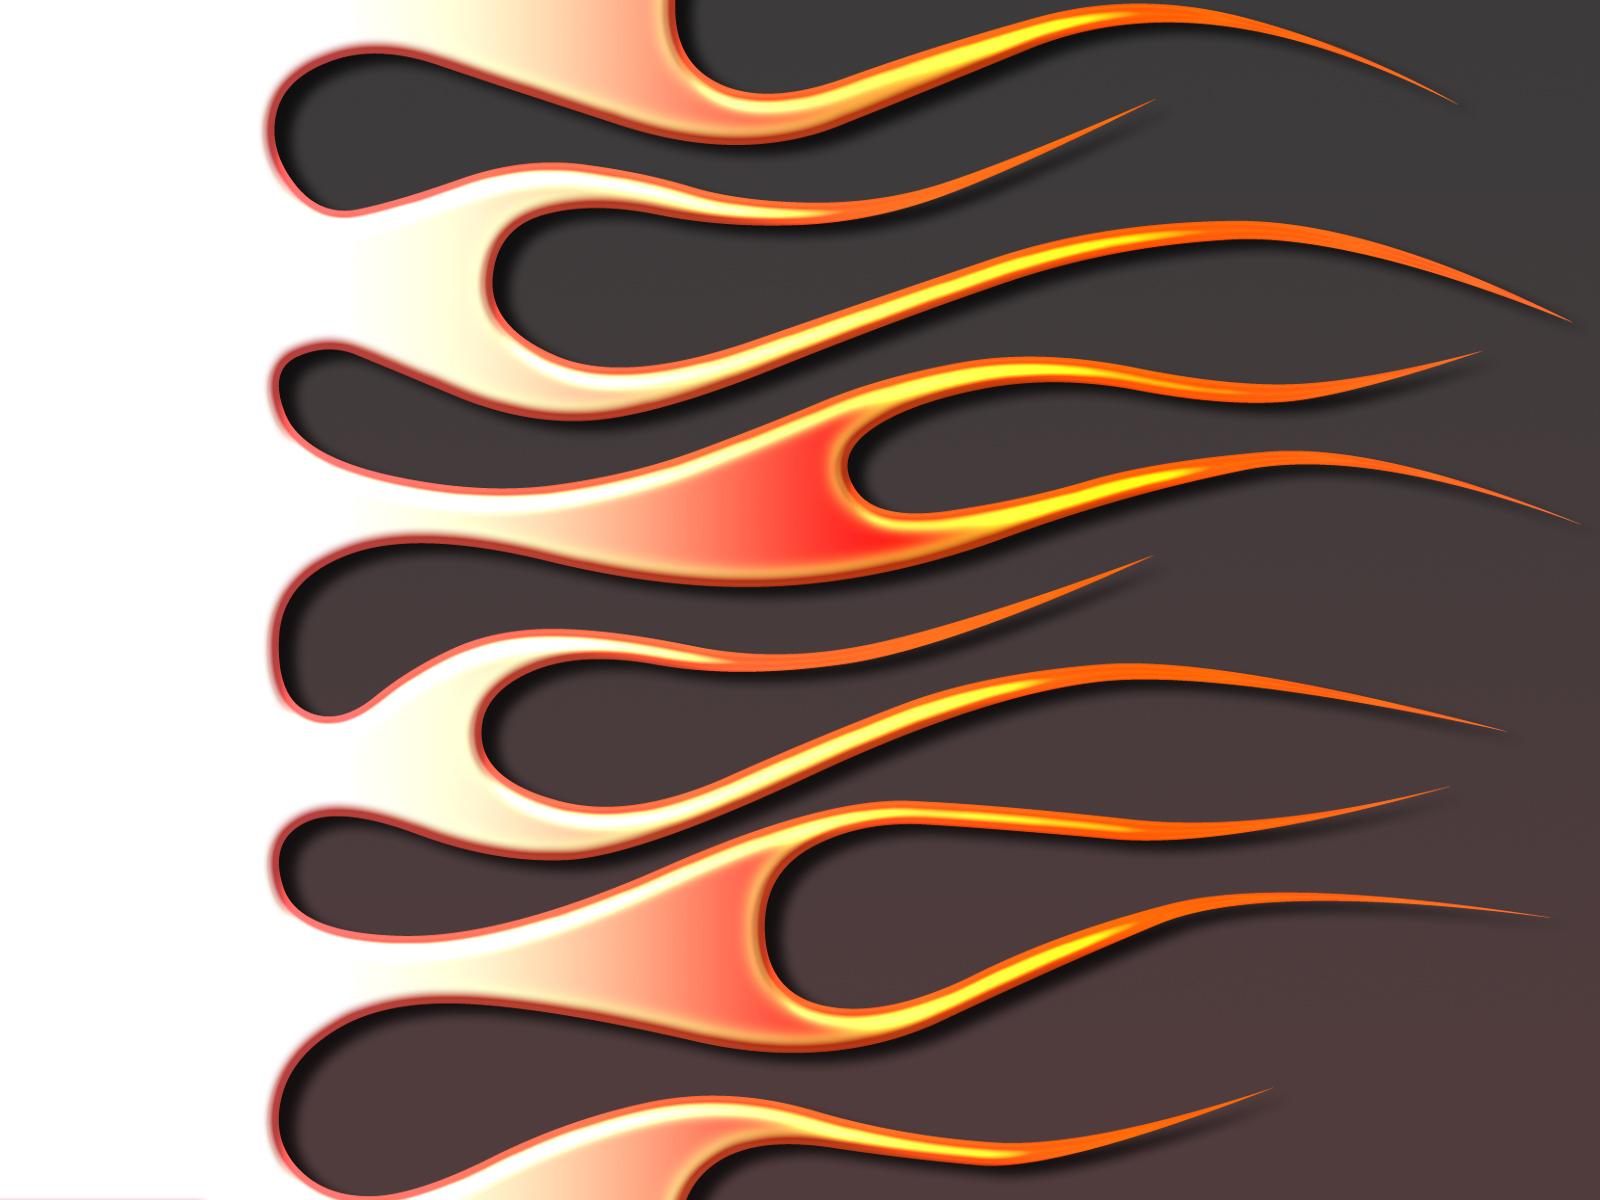 Hot Wheels clipart motorcycle flames Flames  Single line Hot